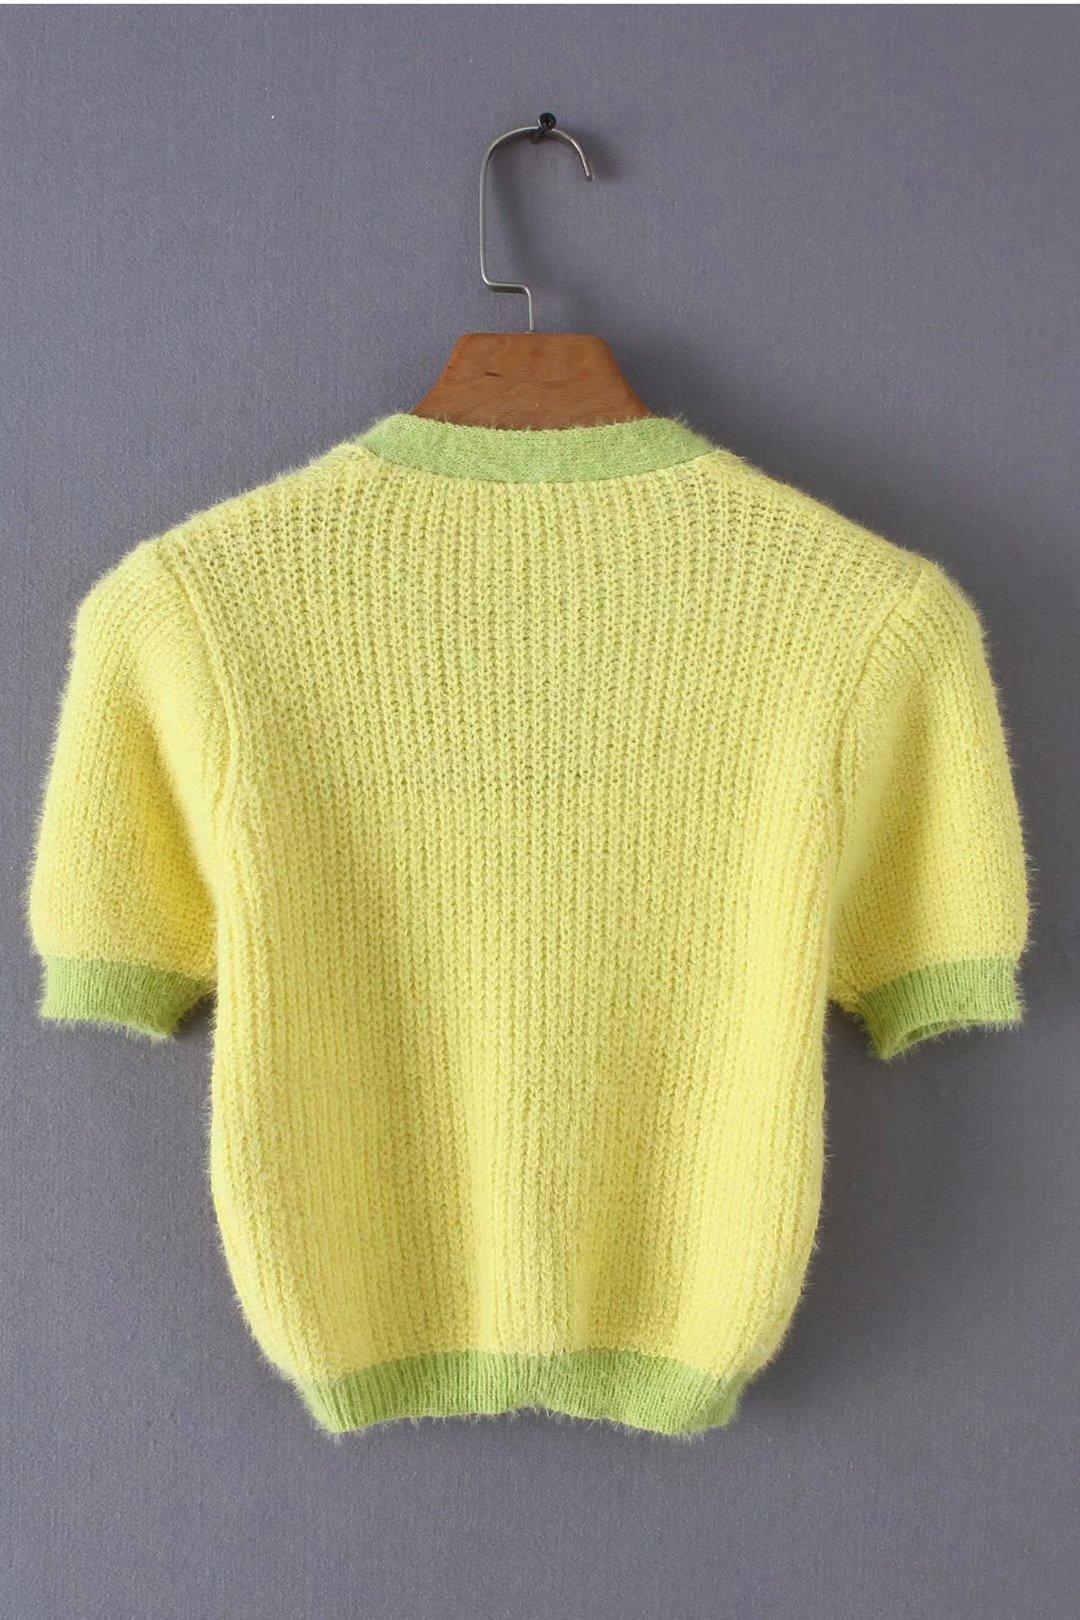 Pink cardigan womens sweaters korean crop sweater yellow autumn tops short sleeve v neck short cardigan mohair sweater fall 19 11